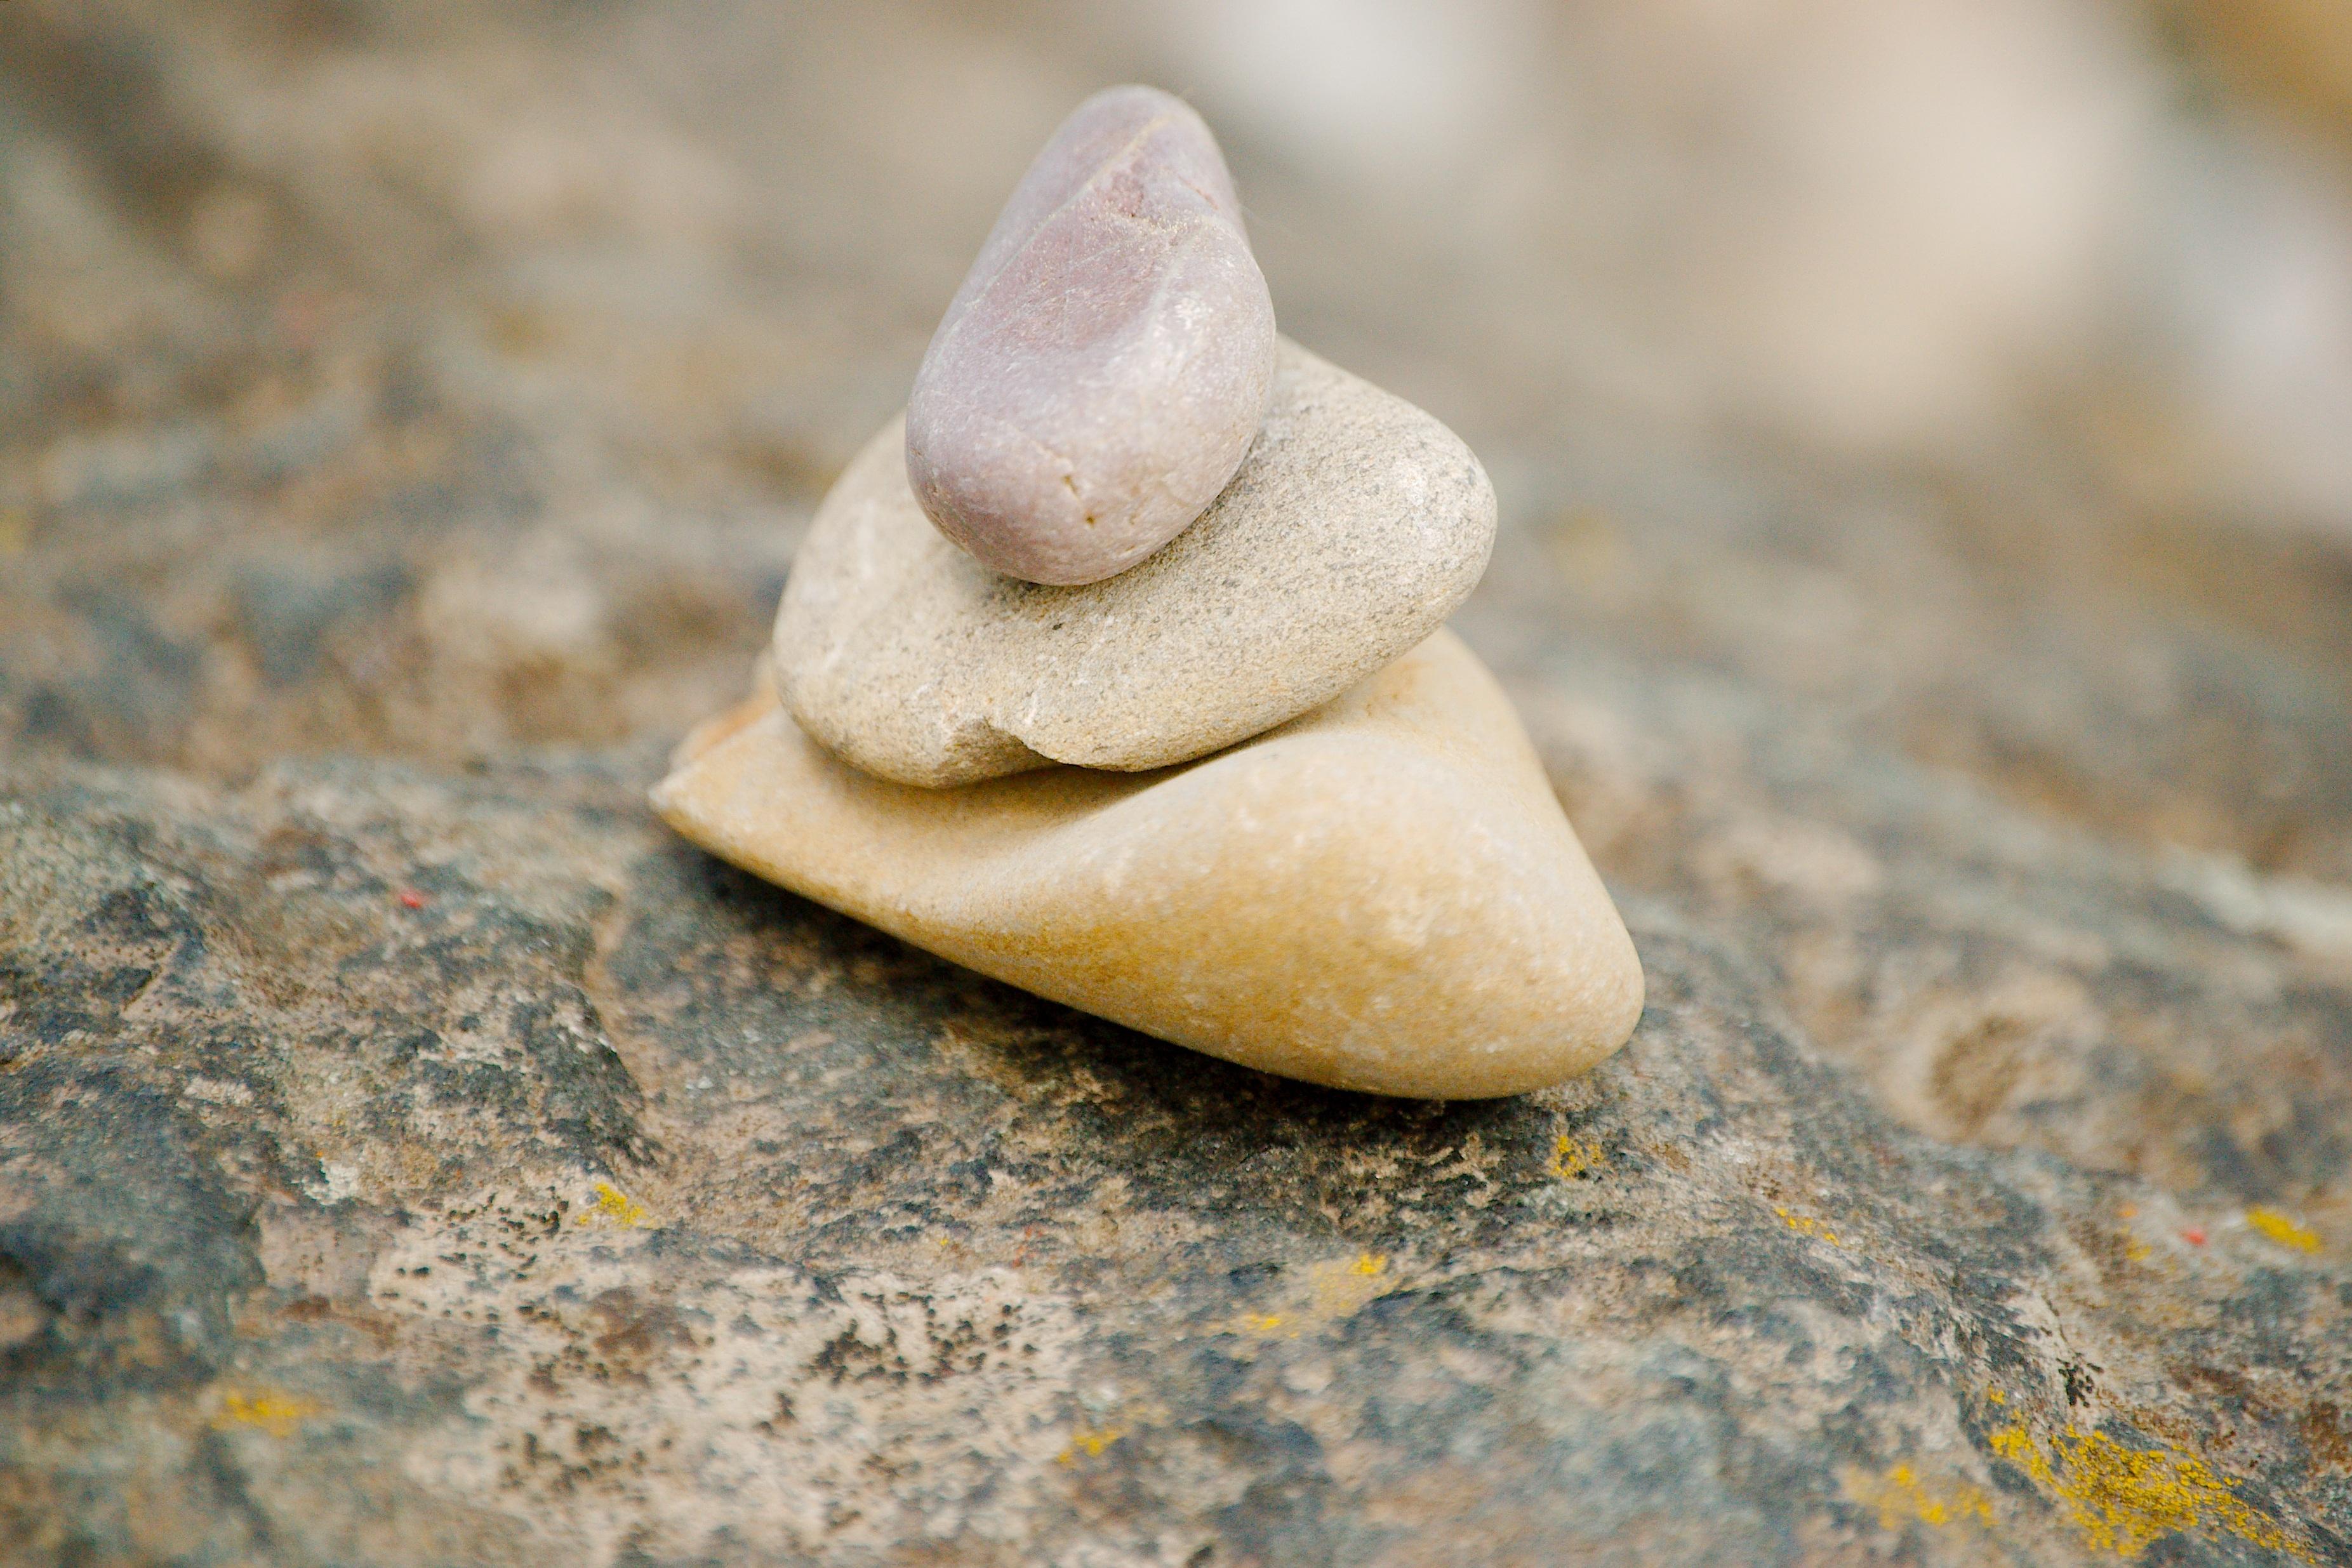 Fotos gratis : playa, naturaleza, arena, rock, verano, decoración ...